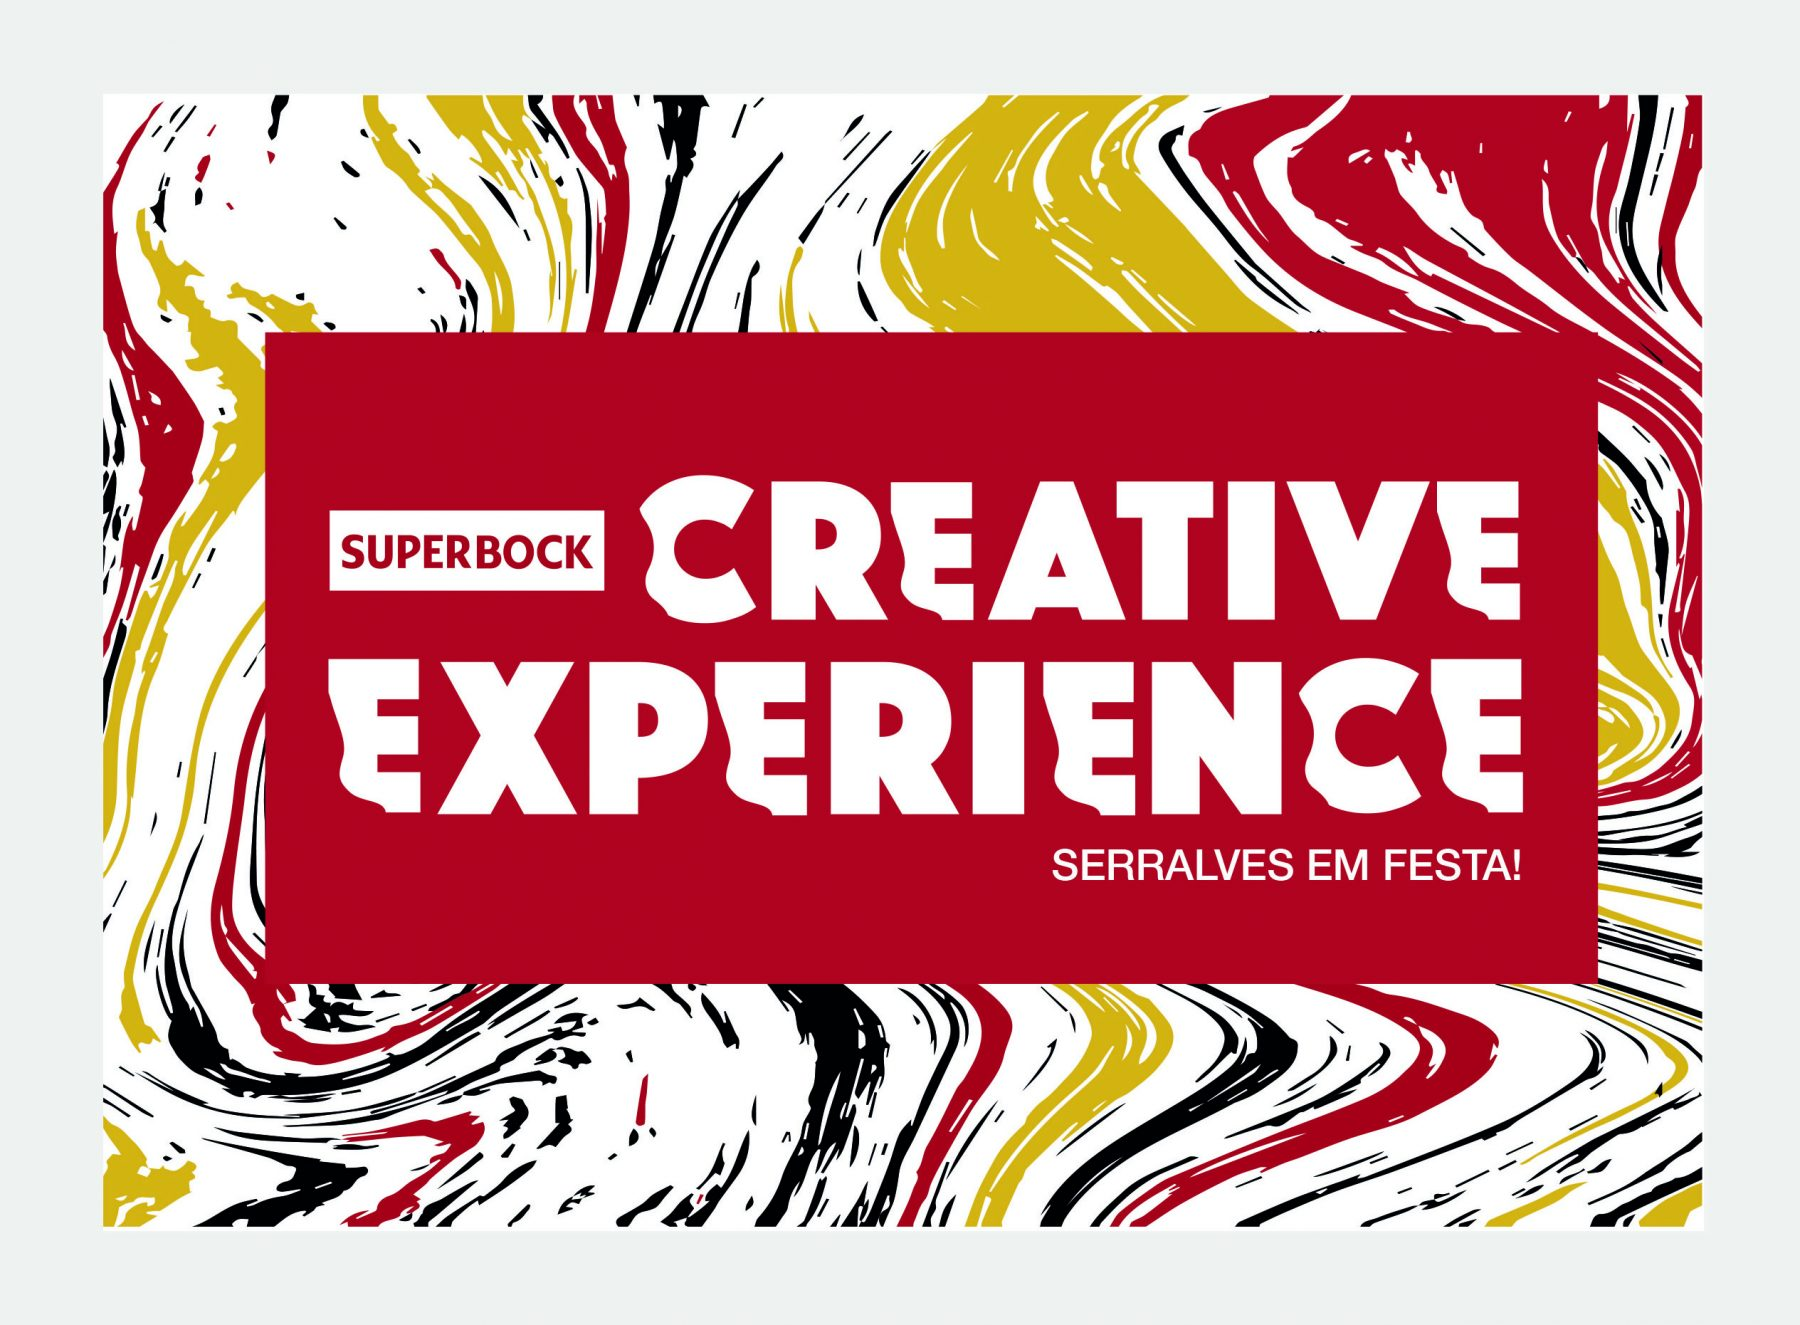 Super Bock Creative Experience